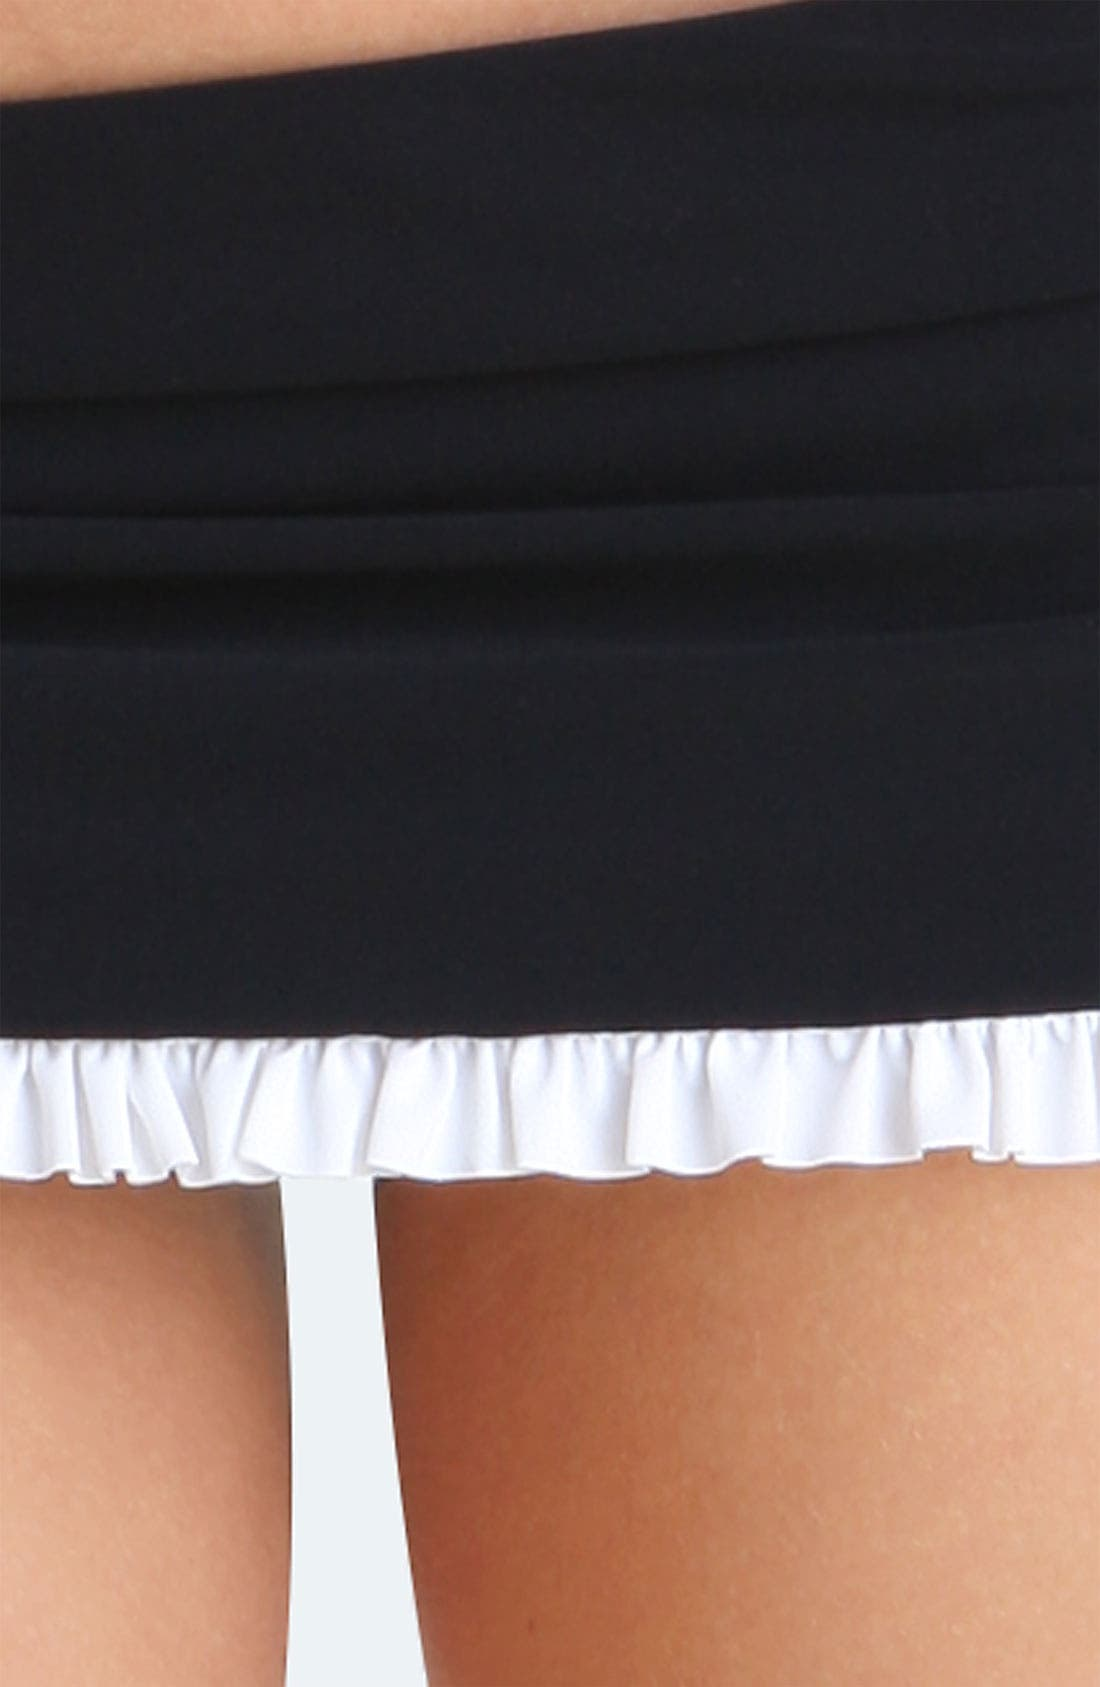 Alternate Image 3  - Profile by Gottex 'Black Tie' Skirted Bikini Bottoms